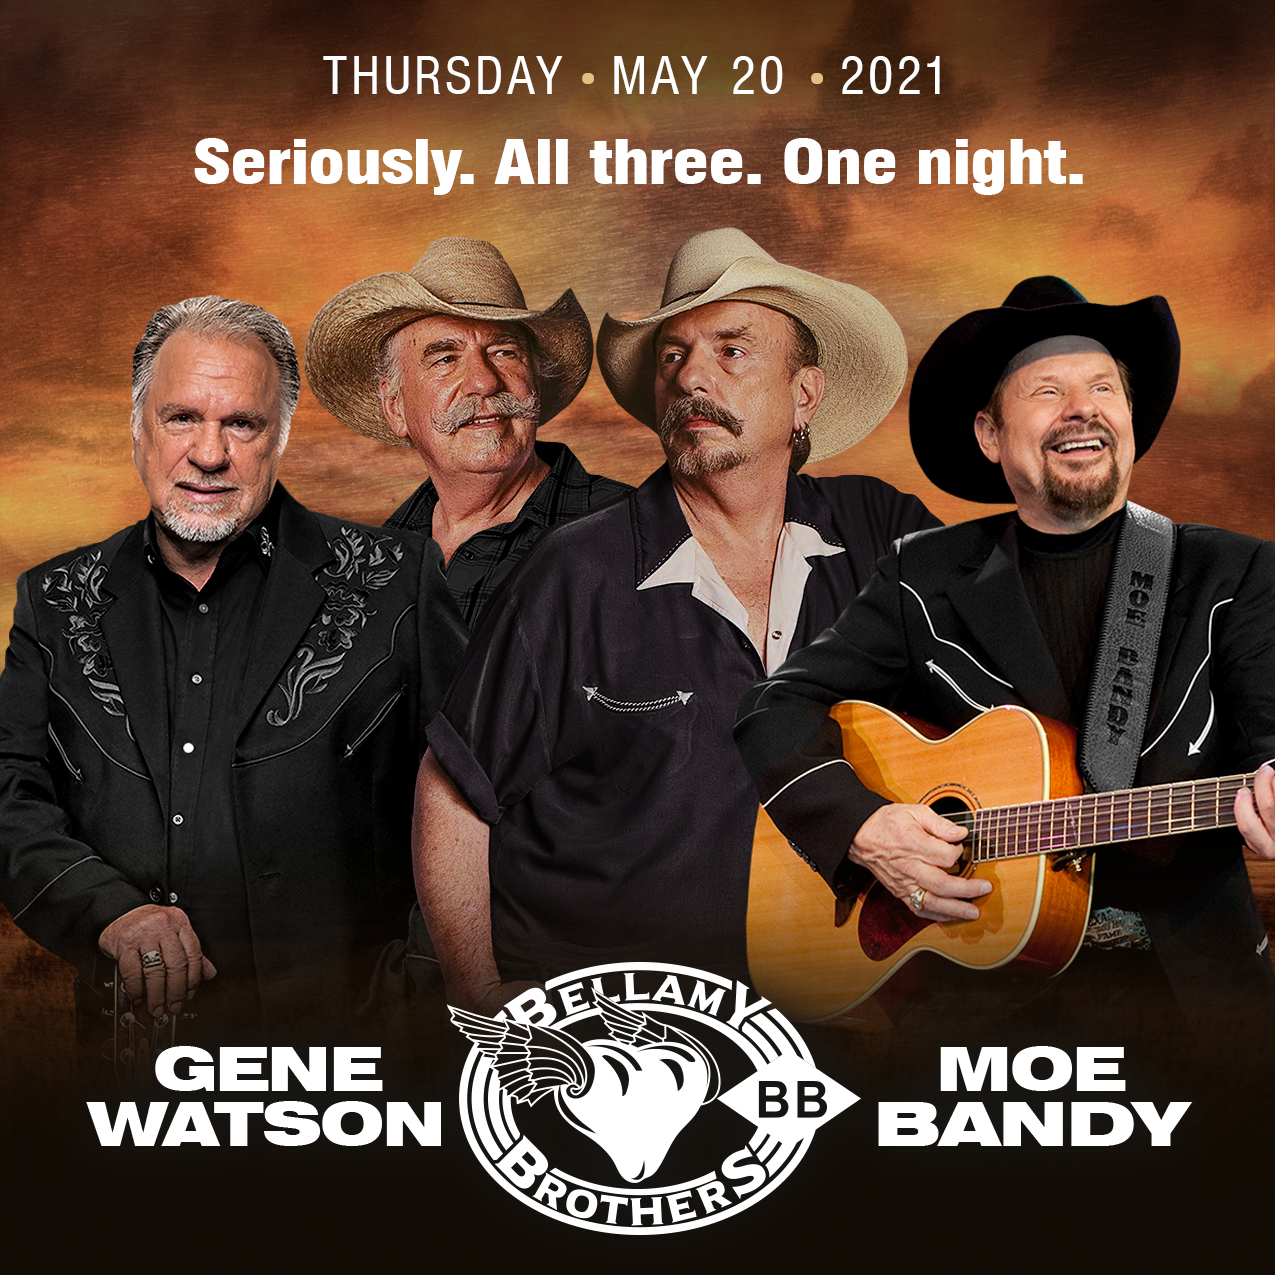 Gene Watson, Bellamy Bros., Moe Bandy